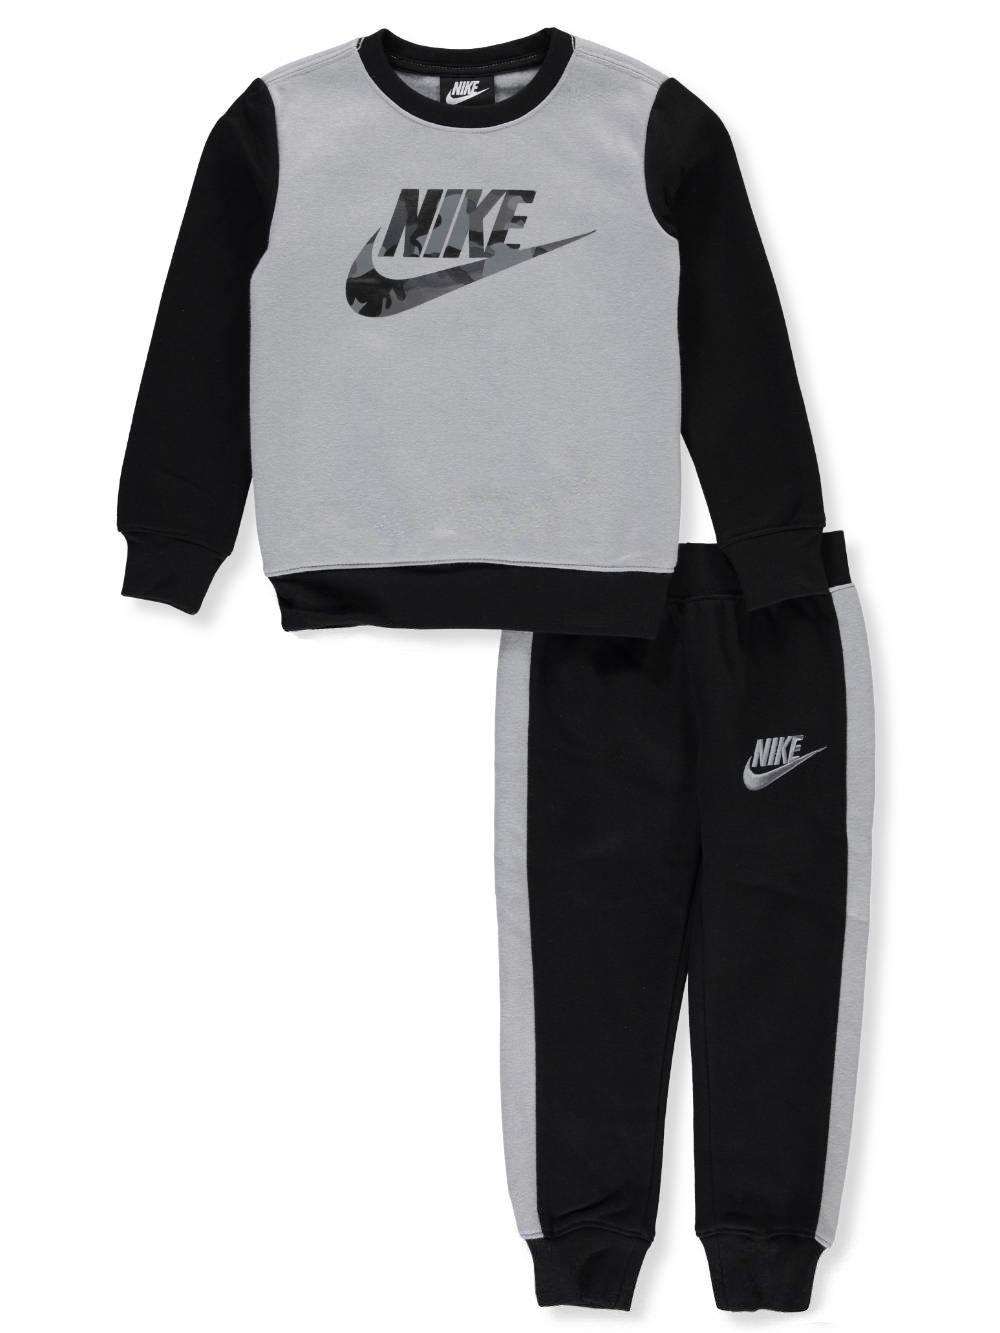 NIKE Boys' 2-Piece Sweatsuit Pants Set - Black, 2t